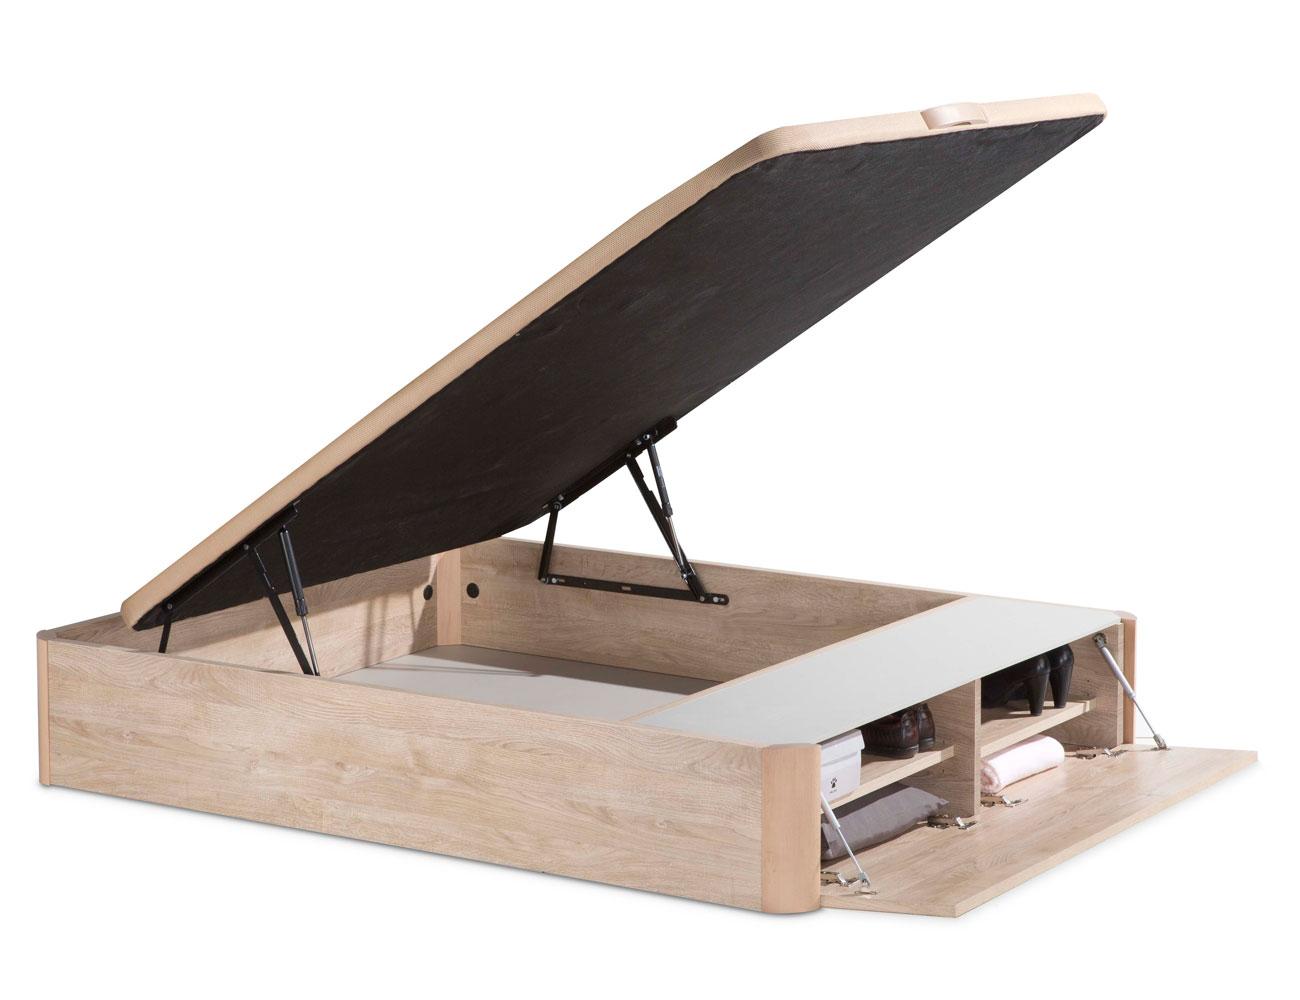 Canape zapatero madera tapa 3d 765